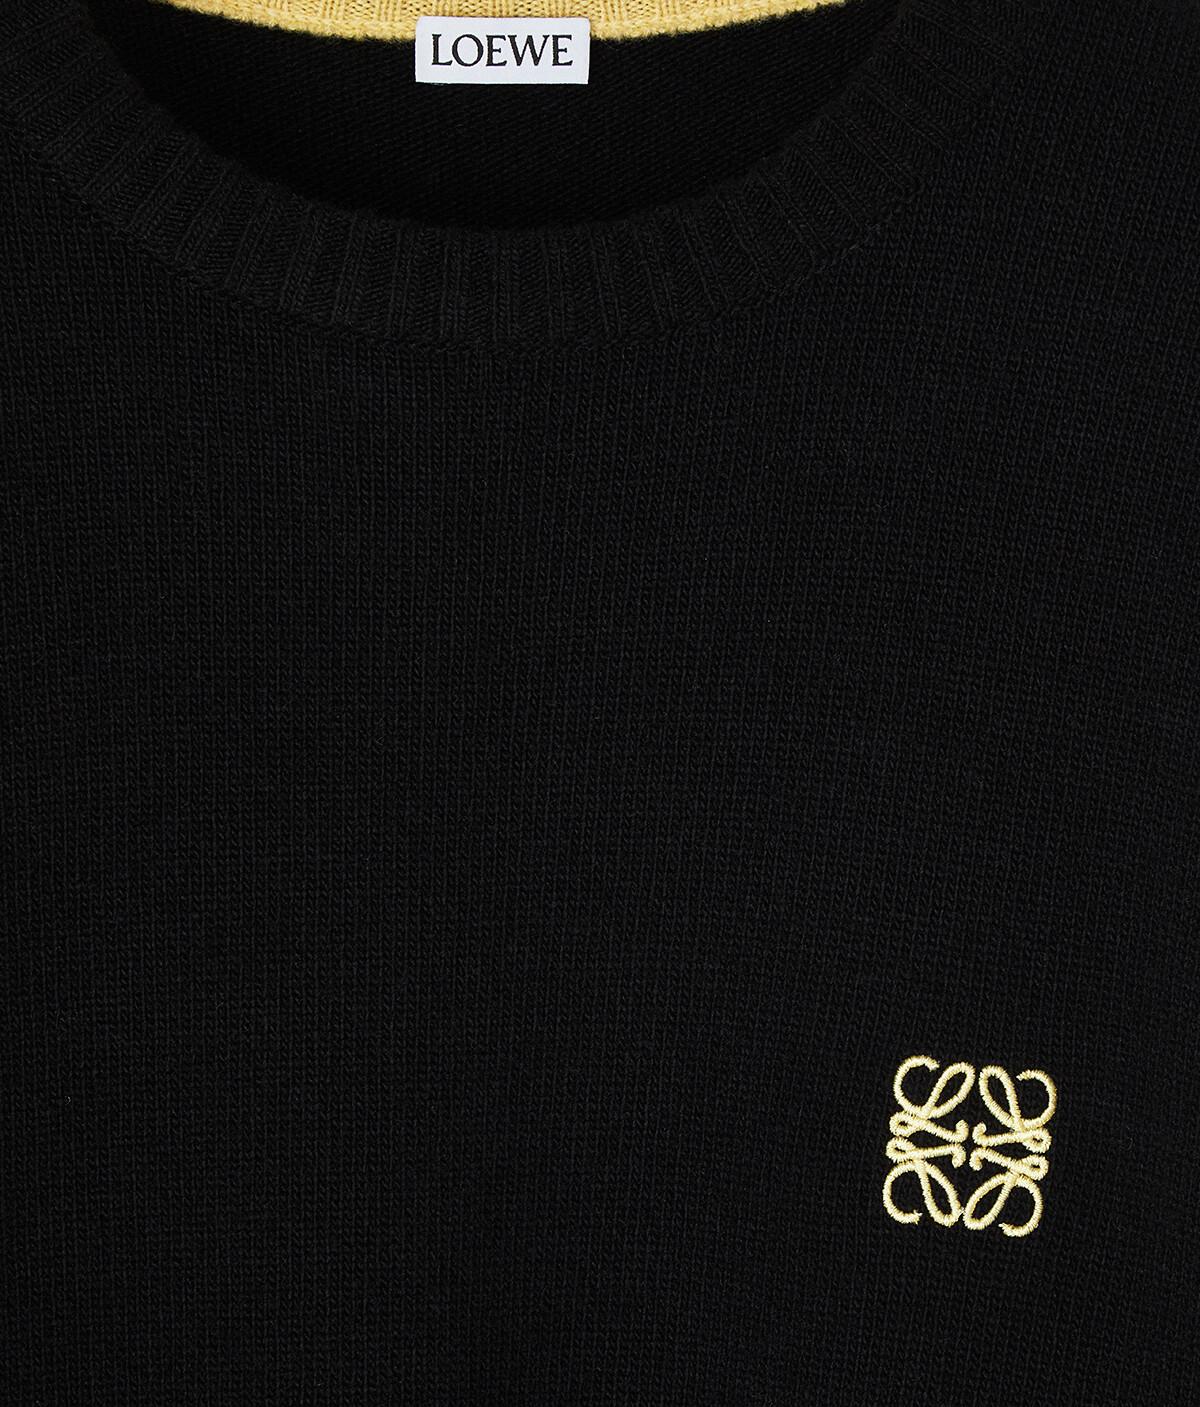 LOEWE Anagram Sweater Negro front